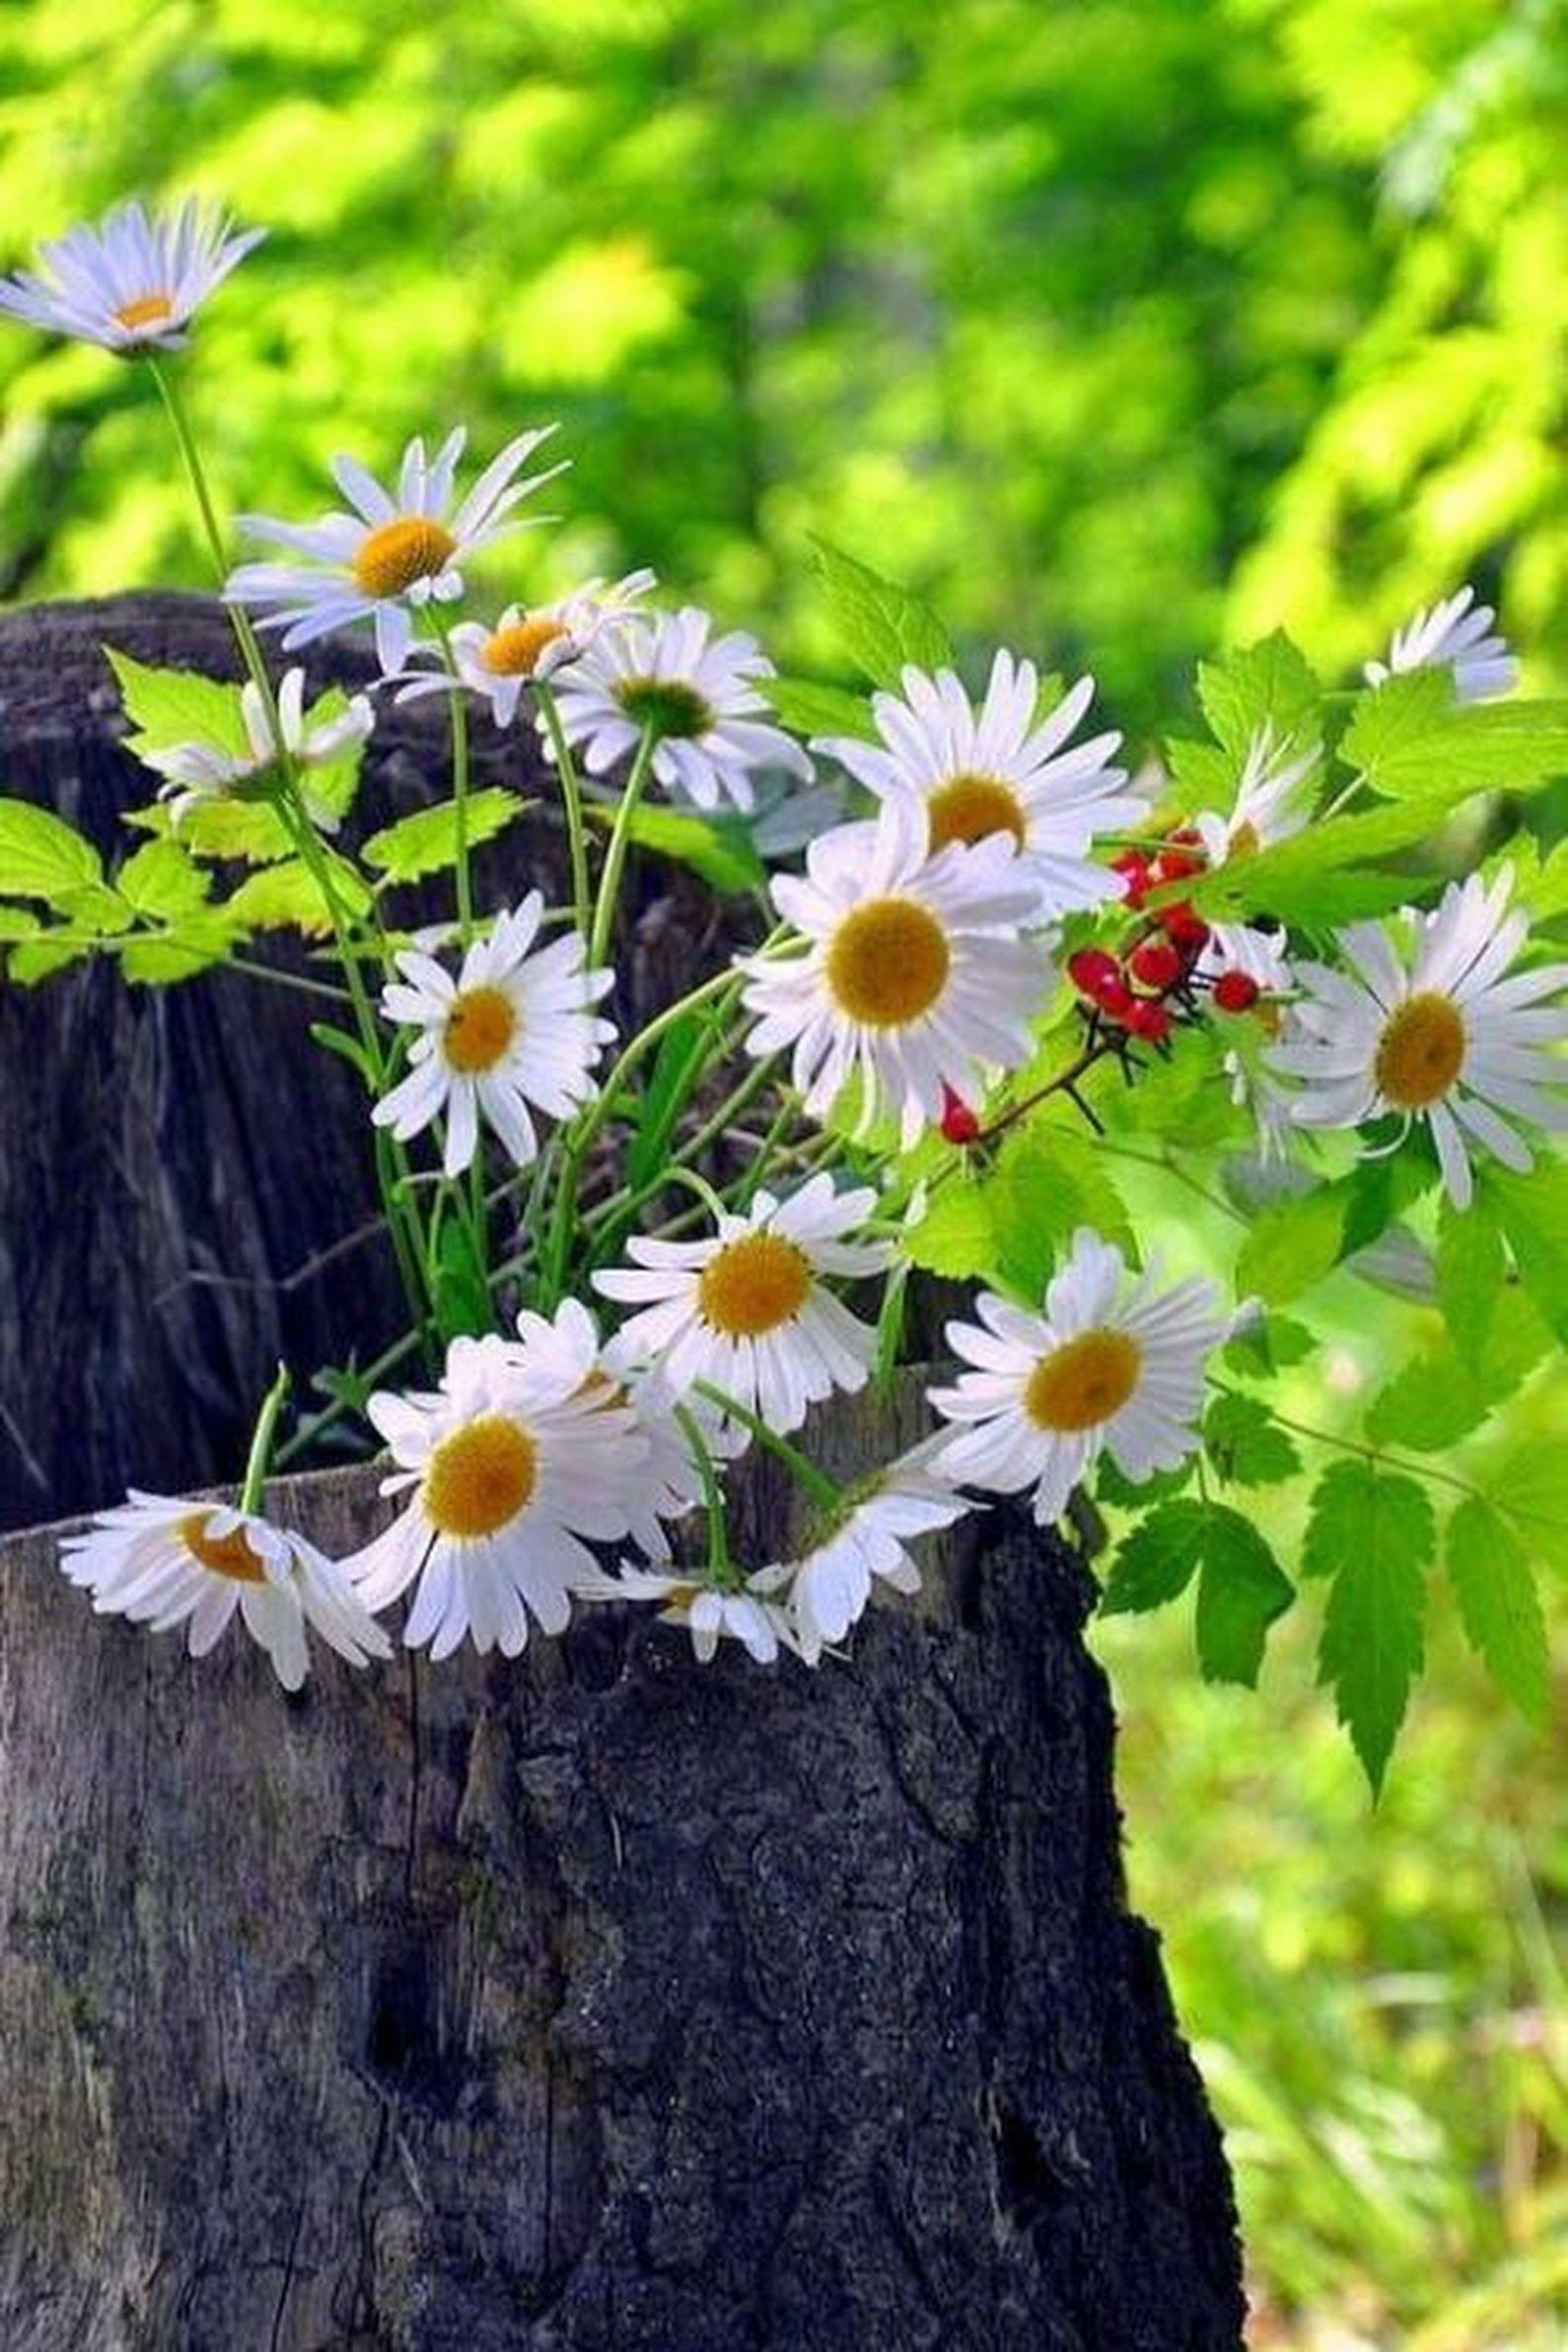 Pin by aundrea morris on me pinterest flowers daisy and sunflowers and daisies daisy flowers wild flowers simple flowers pretty flowers izmirmasajfo